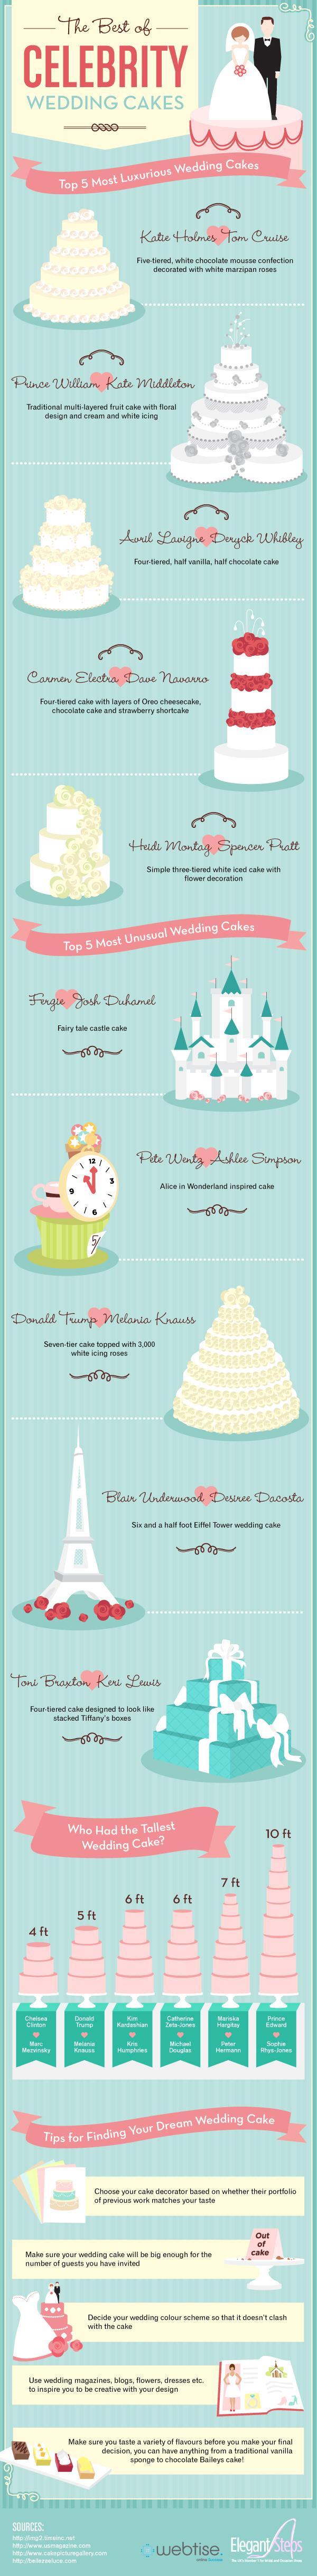 the-best-of-celebrity-wedding-cakes_50cb1368b9605